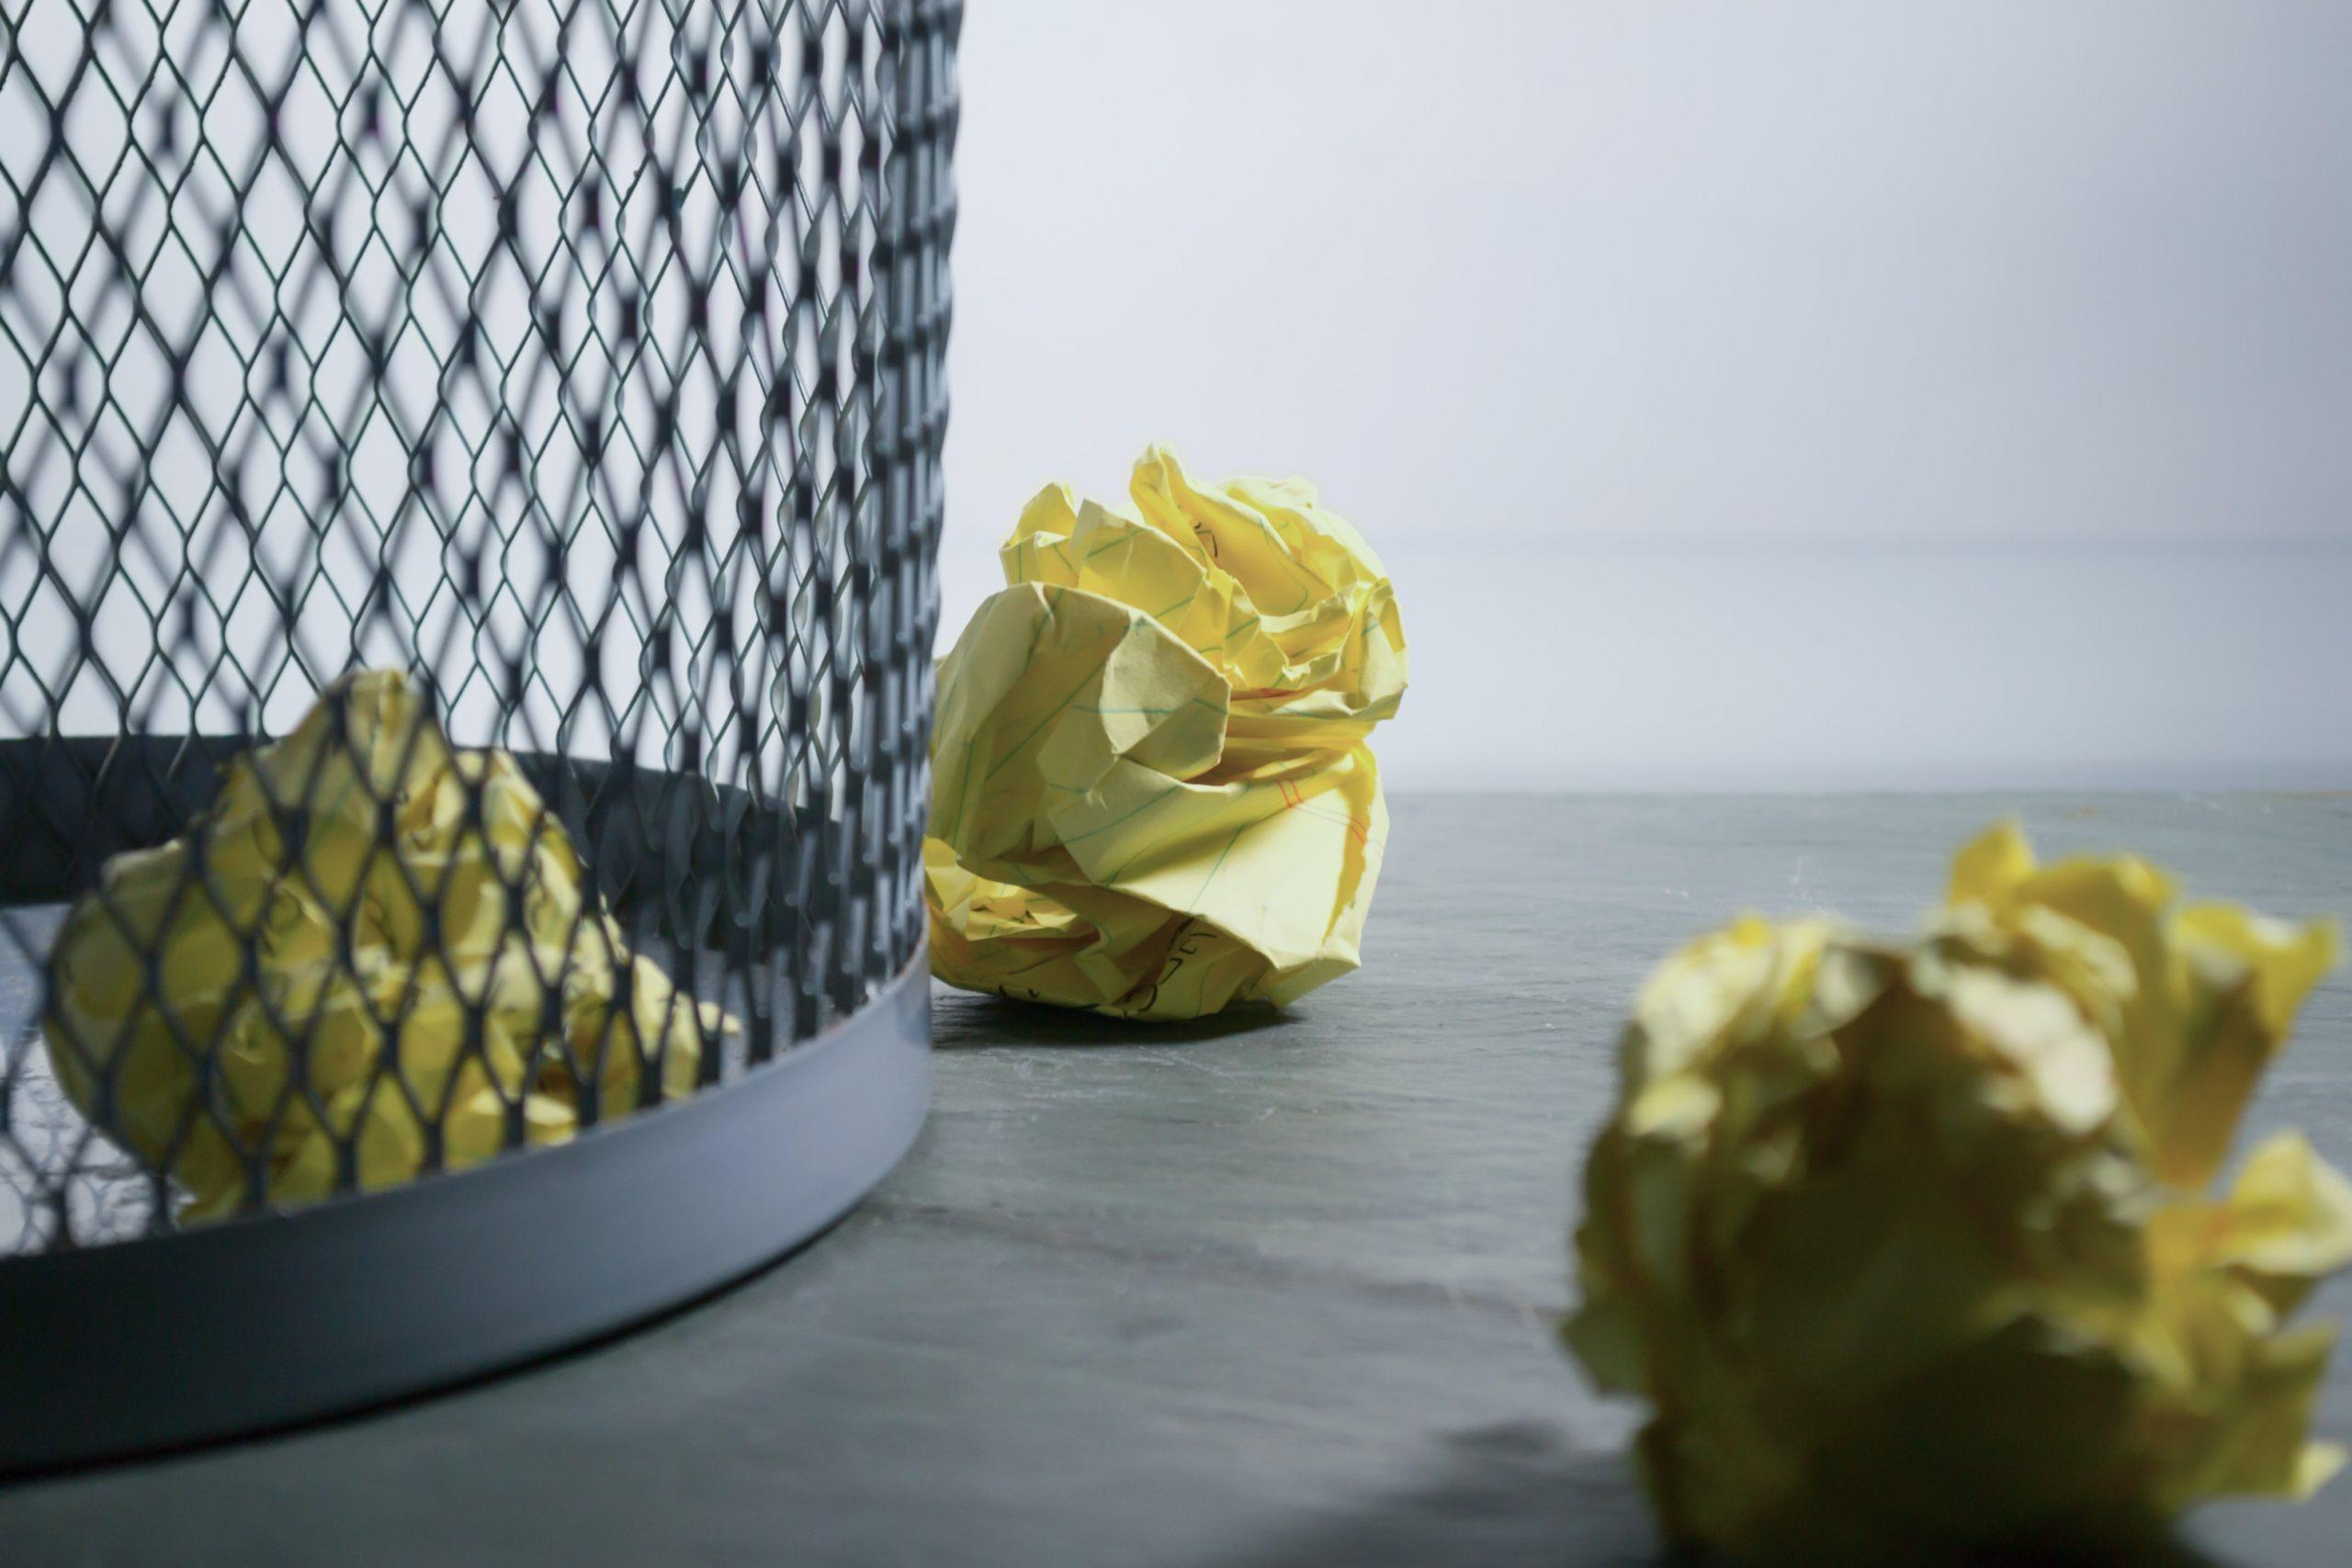 Crumpled paper in and around a bin